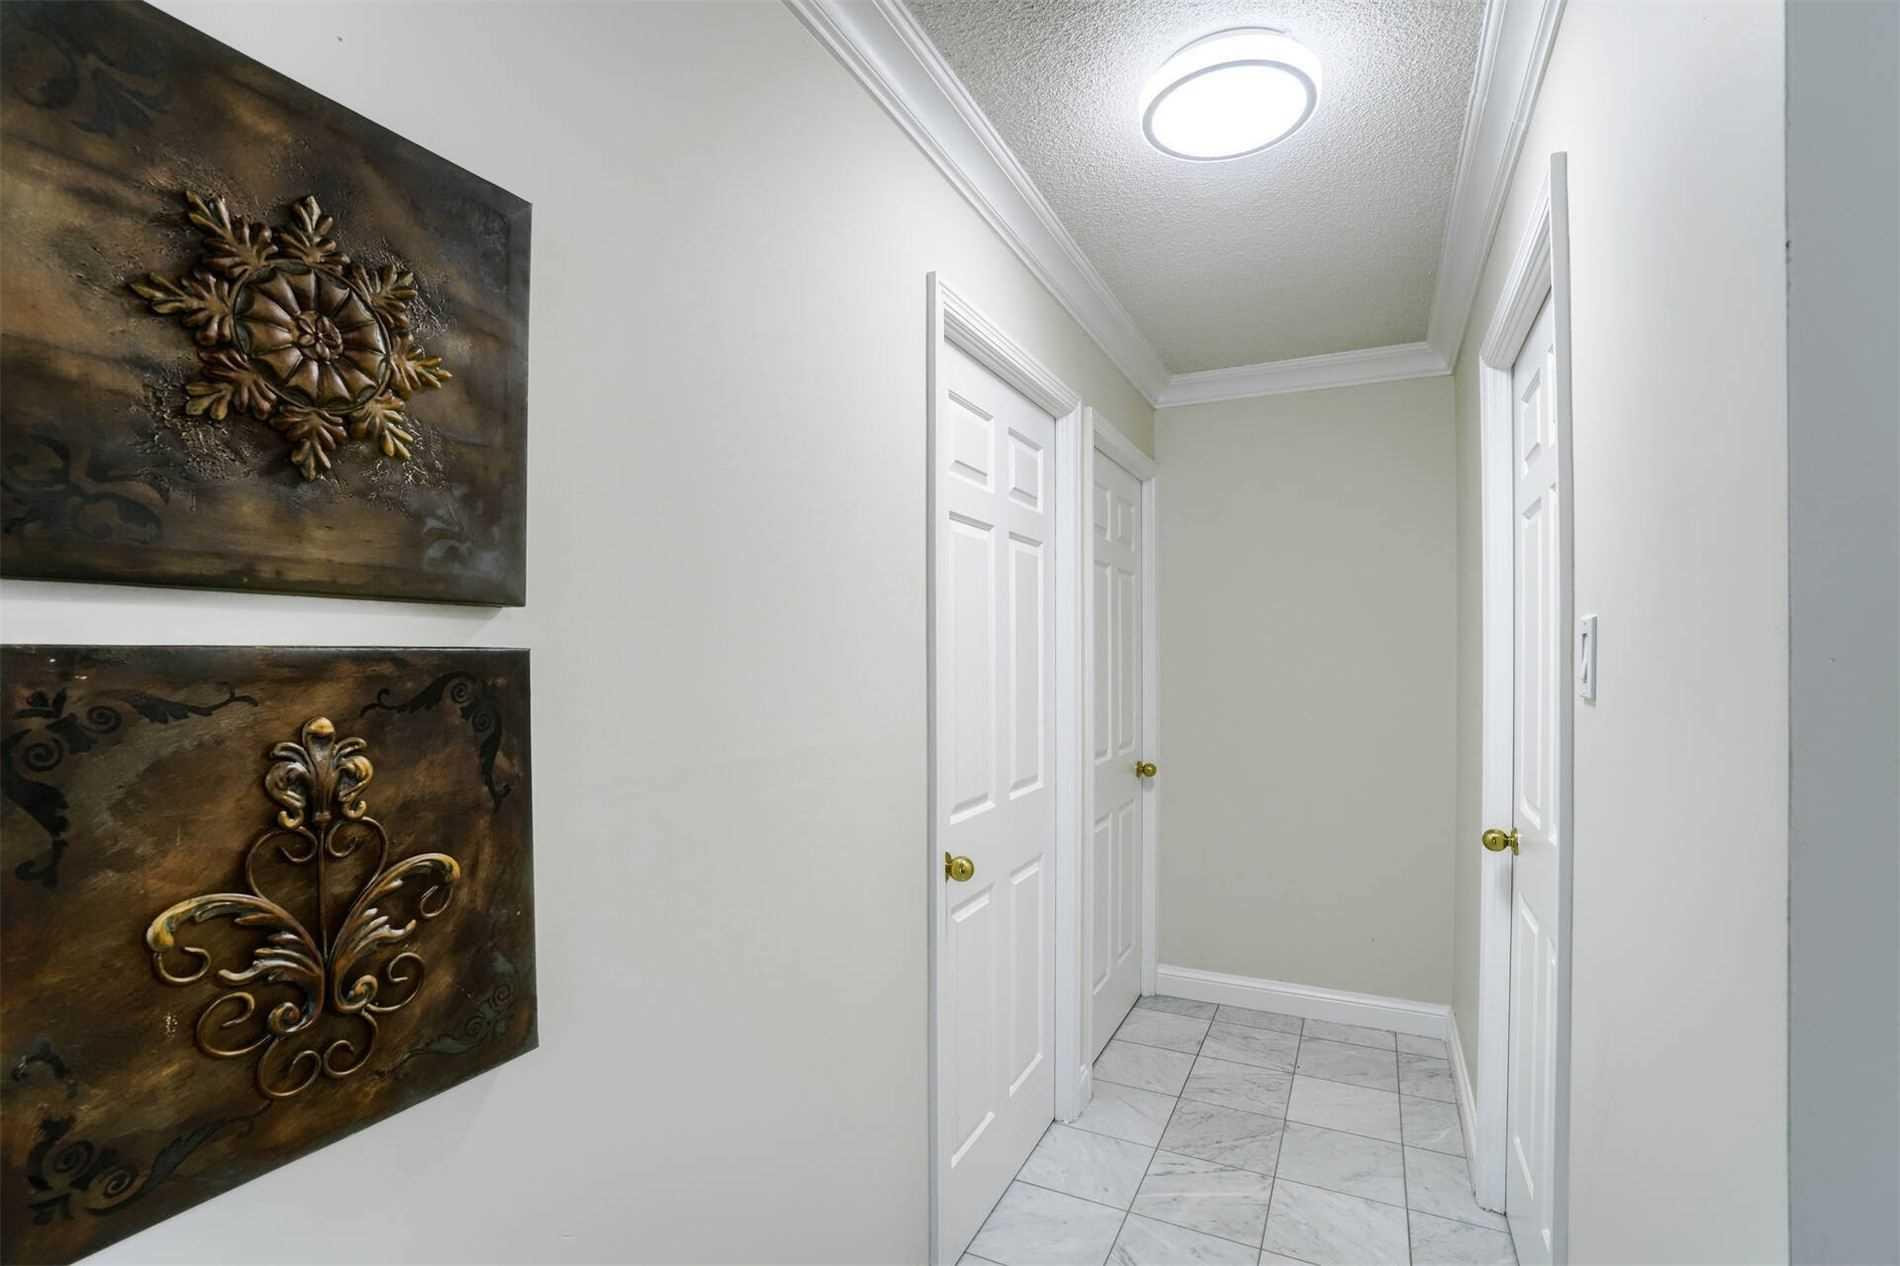 Condo Apt For Sale In Brampton , 2 Bedrooms Bedrooms, ,2 BathroomsBathrooms,Condo Apt,For Sale,1601,Hanover